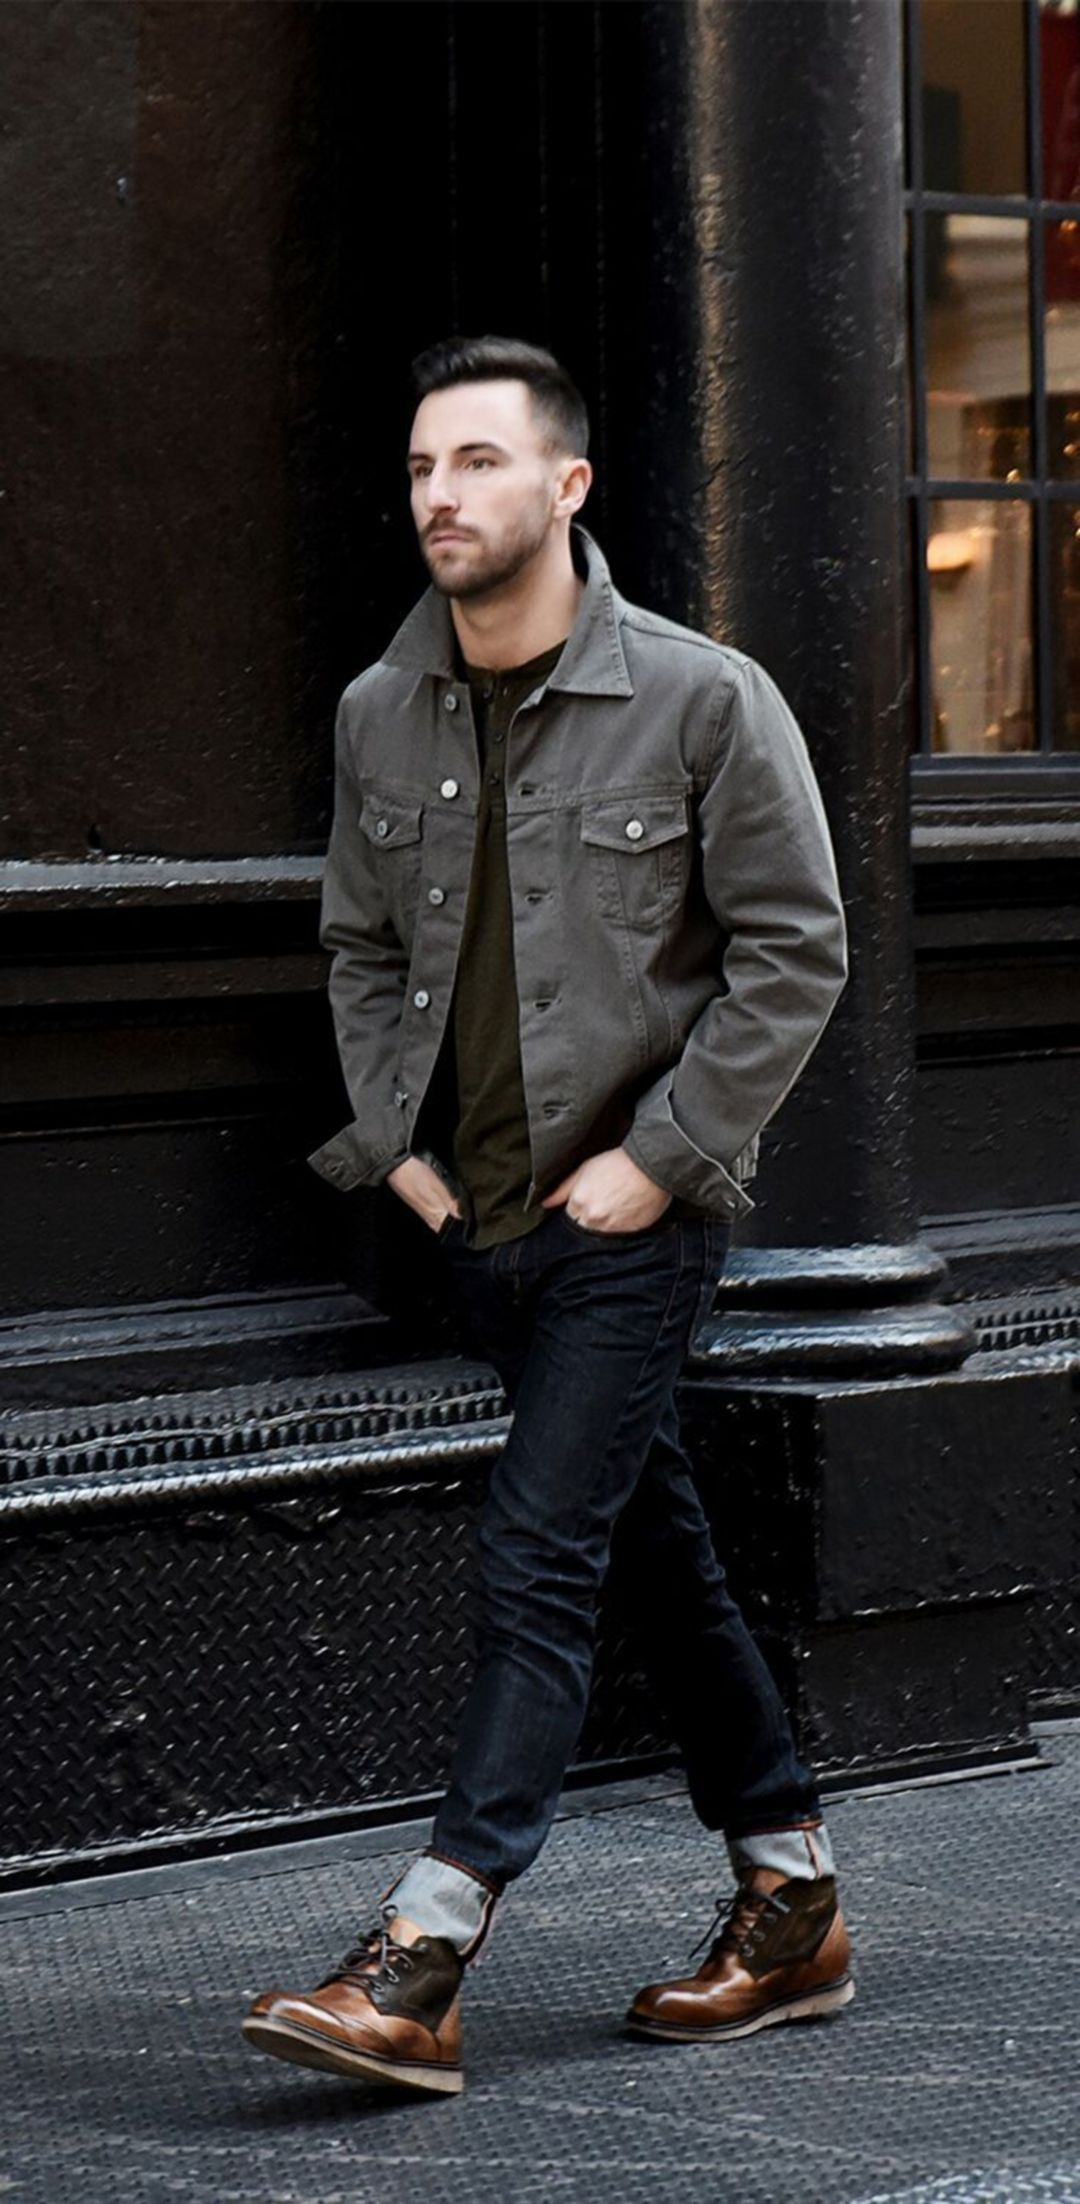 45 Awesome Jeans Jackets Ideas For Men Look Cooler Fashions Nowadays Mens Fashion Denim Denim Jacket Men Mens Fashion Jeans